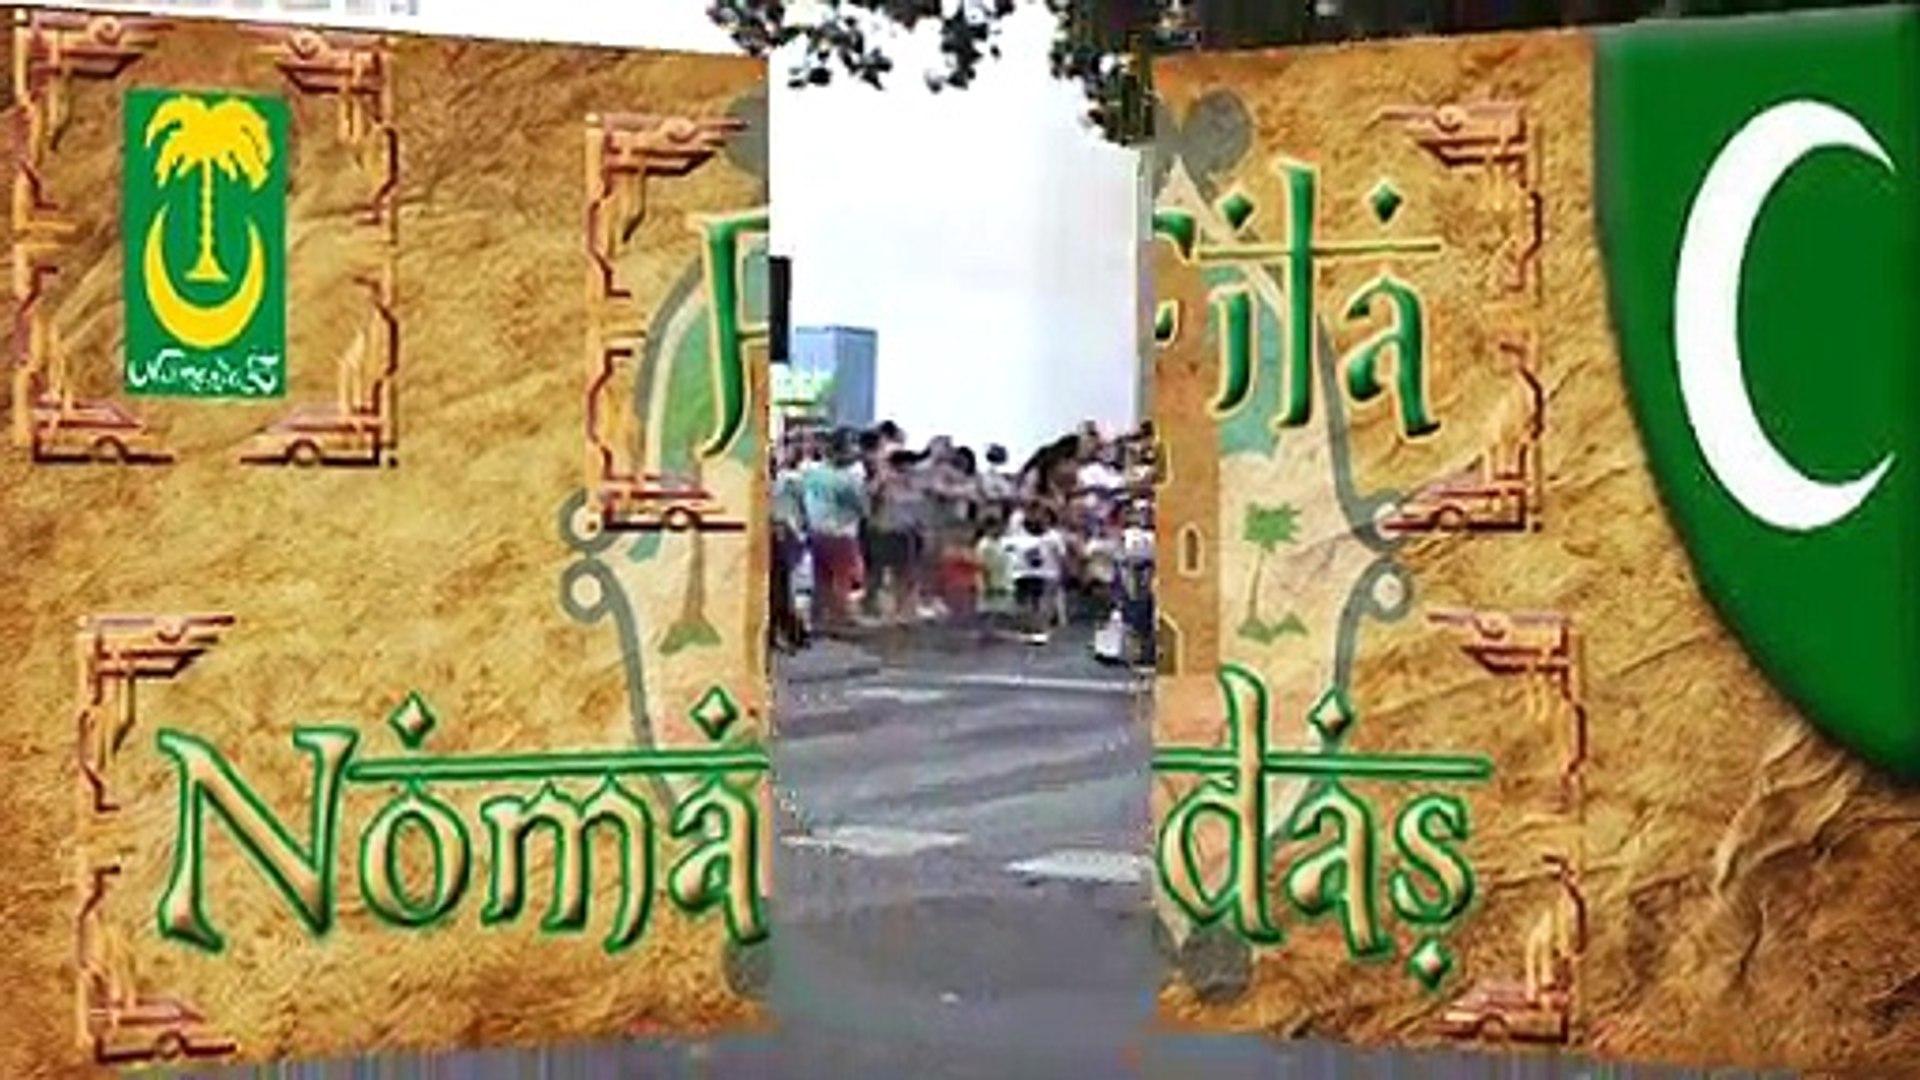 Moros y Cristianos Barrio San Blas Alicante 2016 Filà Nómadas